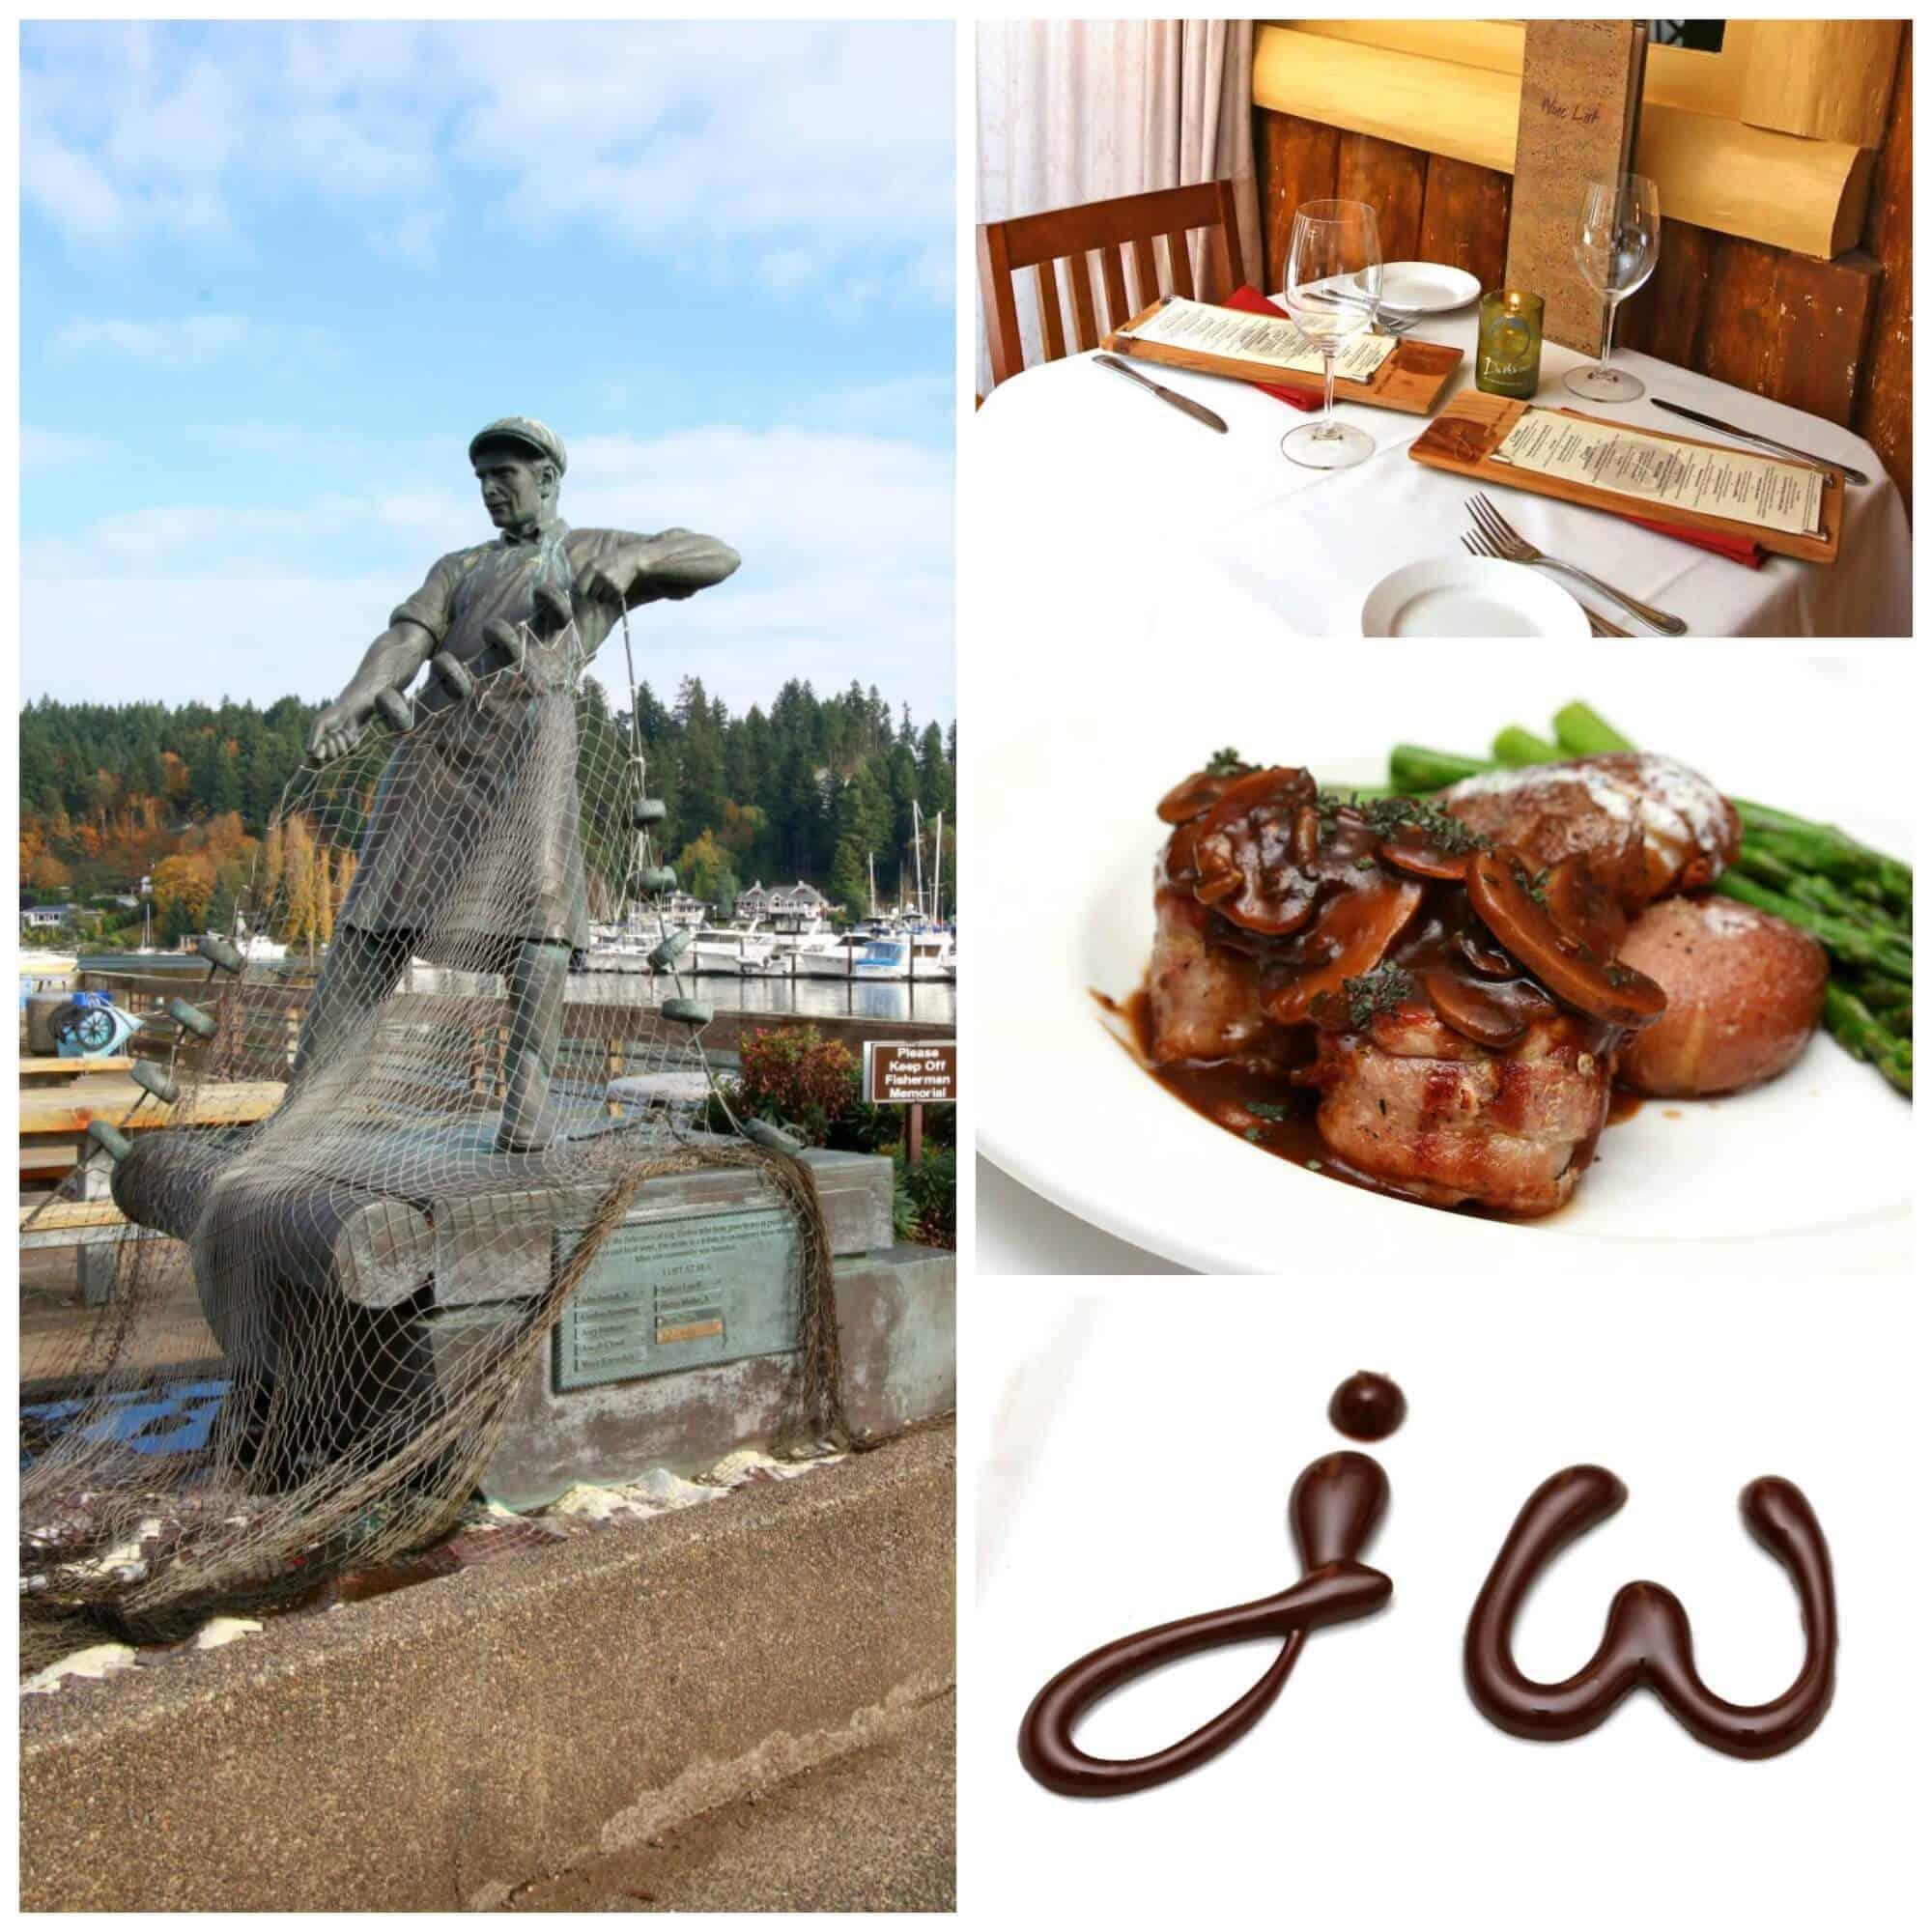 JW Restaurant Gig Harbor WA The South Sound 39 S Best 5 Years